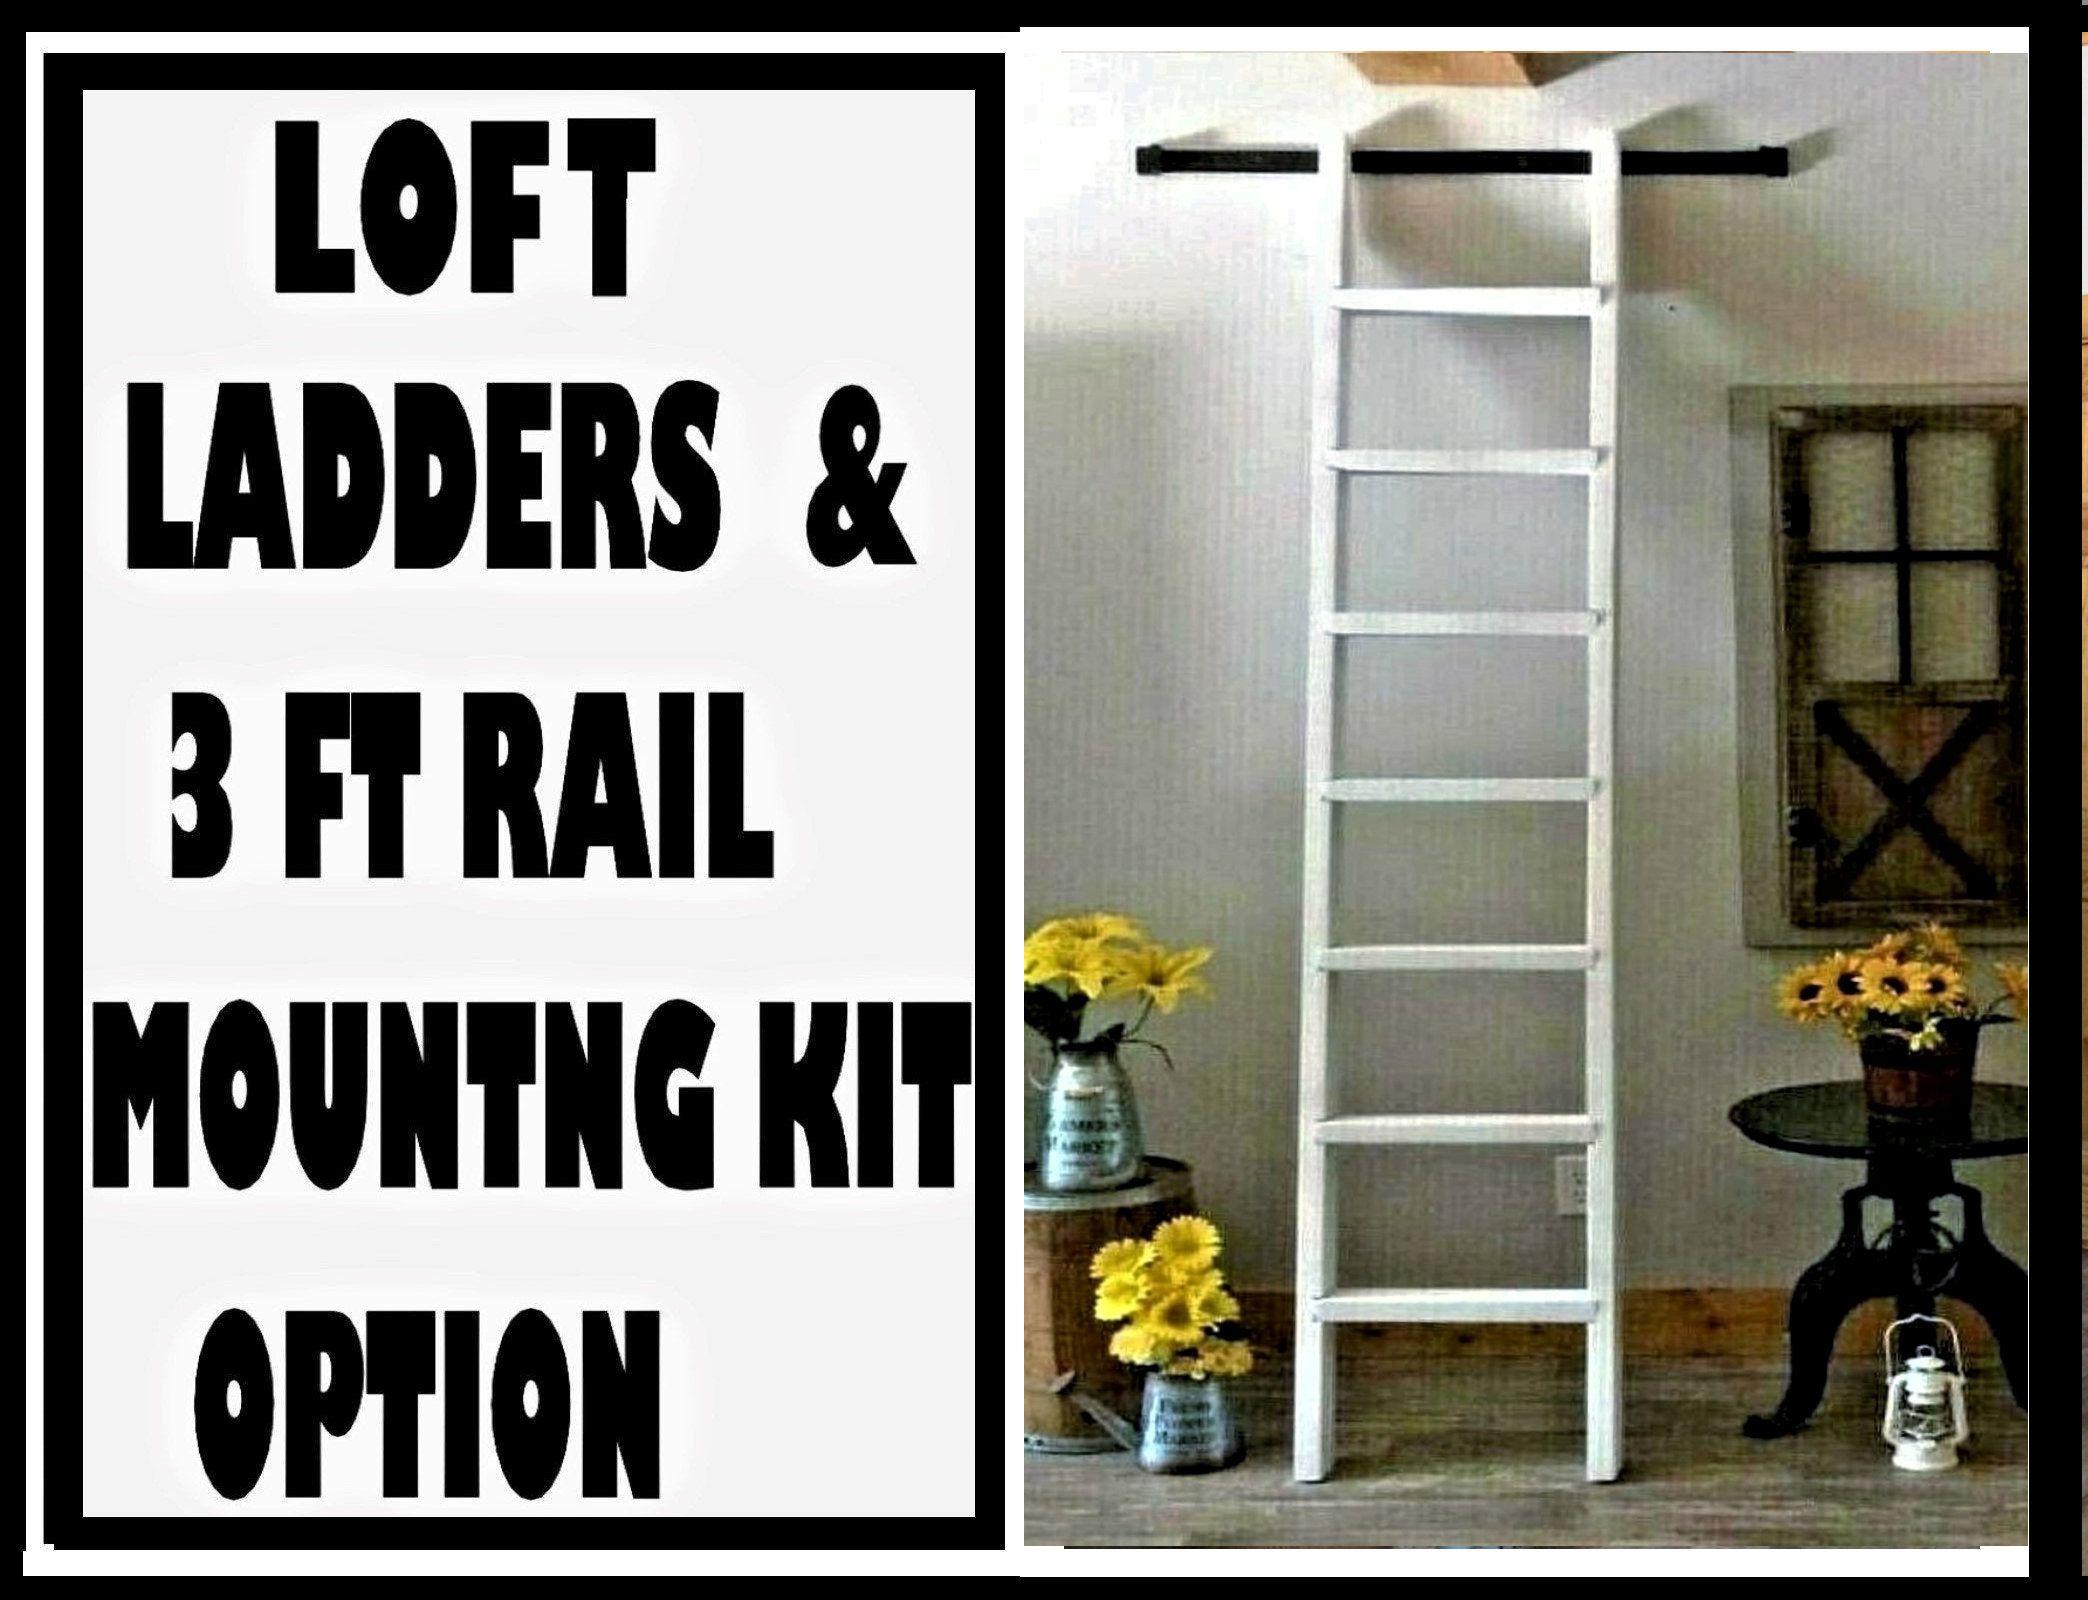 White Loft Ladder Mountng Kit Option 3ft Rail Top Hooks Hooks Come Atached To Ladder Then Ladder Hangs Onrail Wood Loft Ladders In 2020 Loft Ladder White Loft Ladder